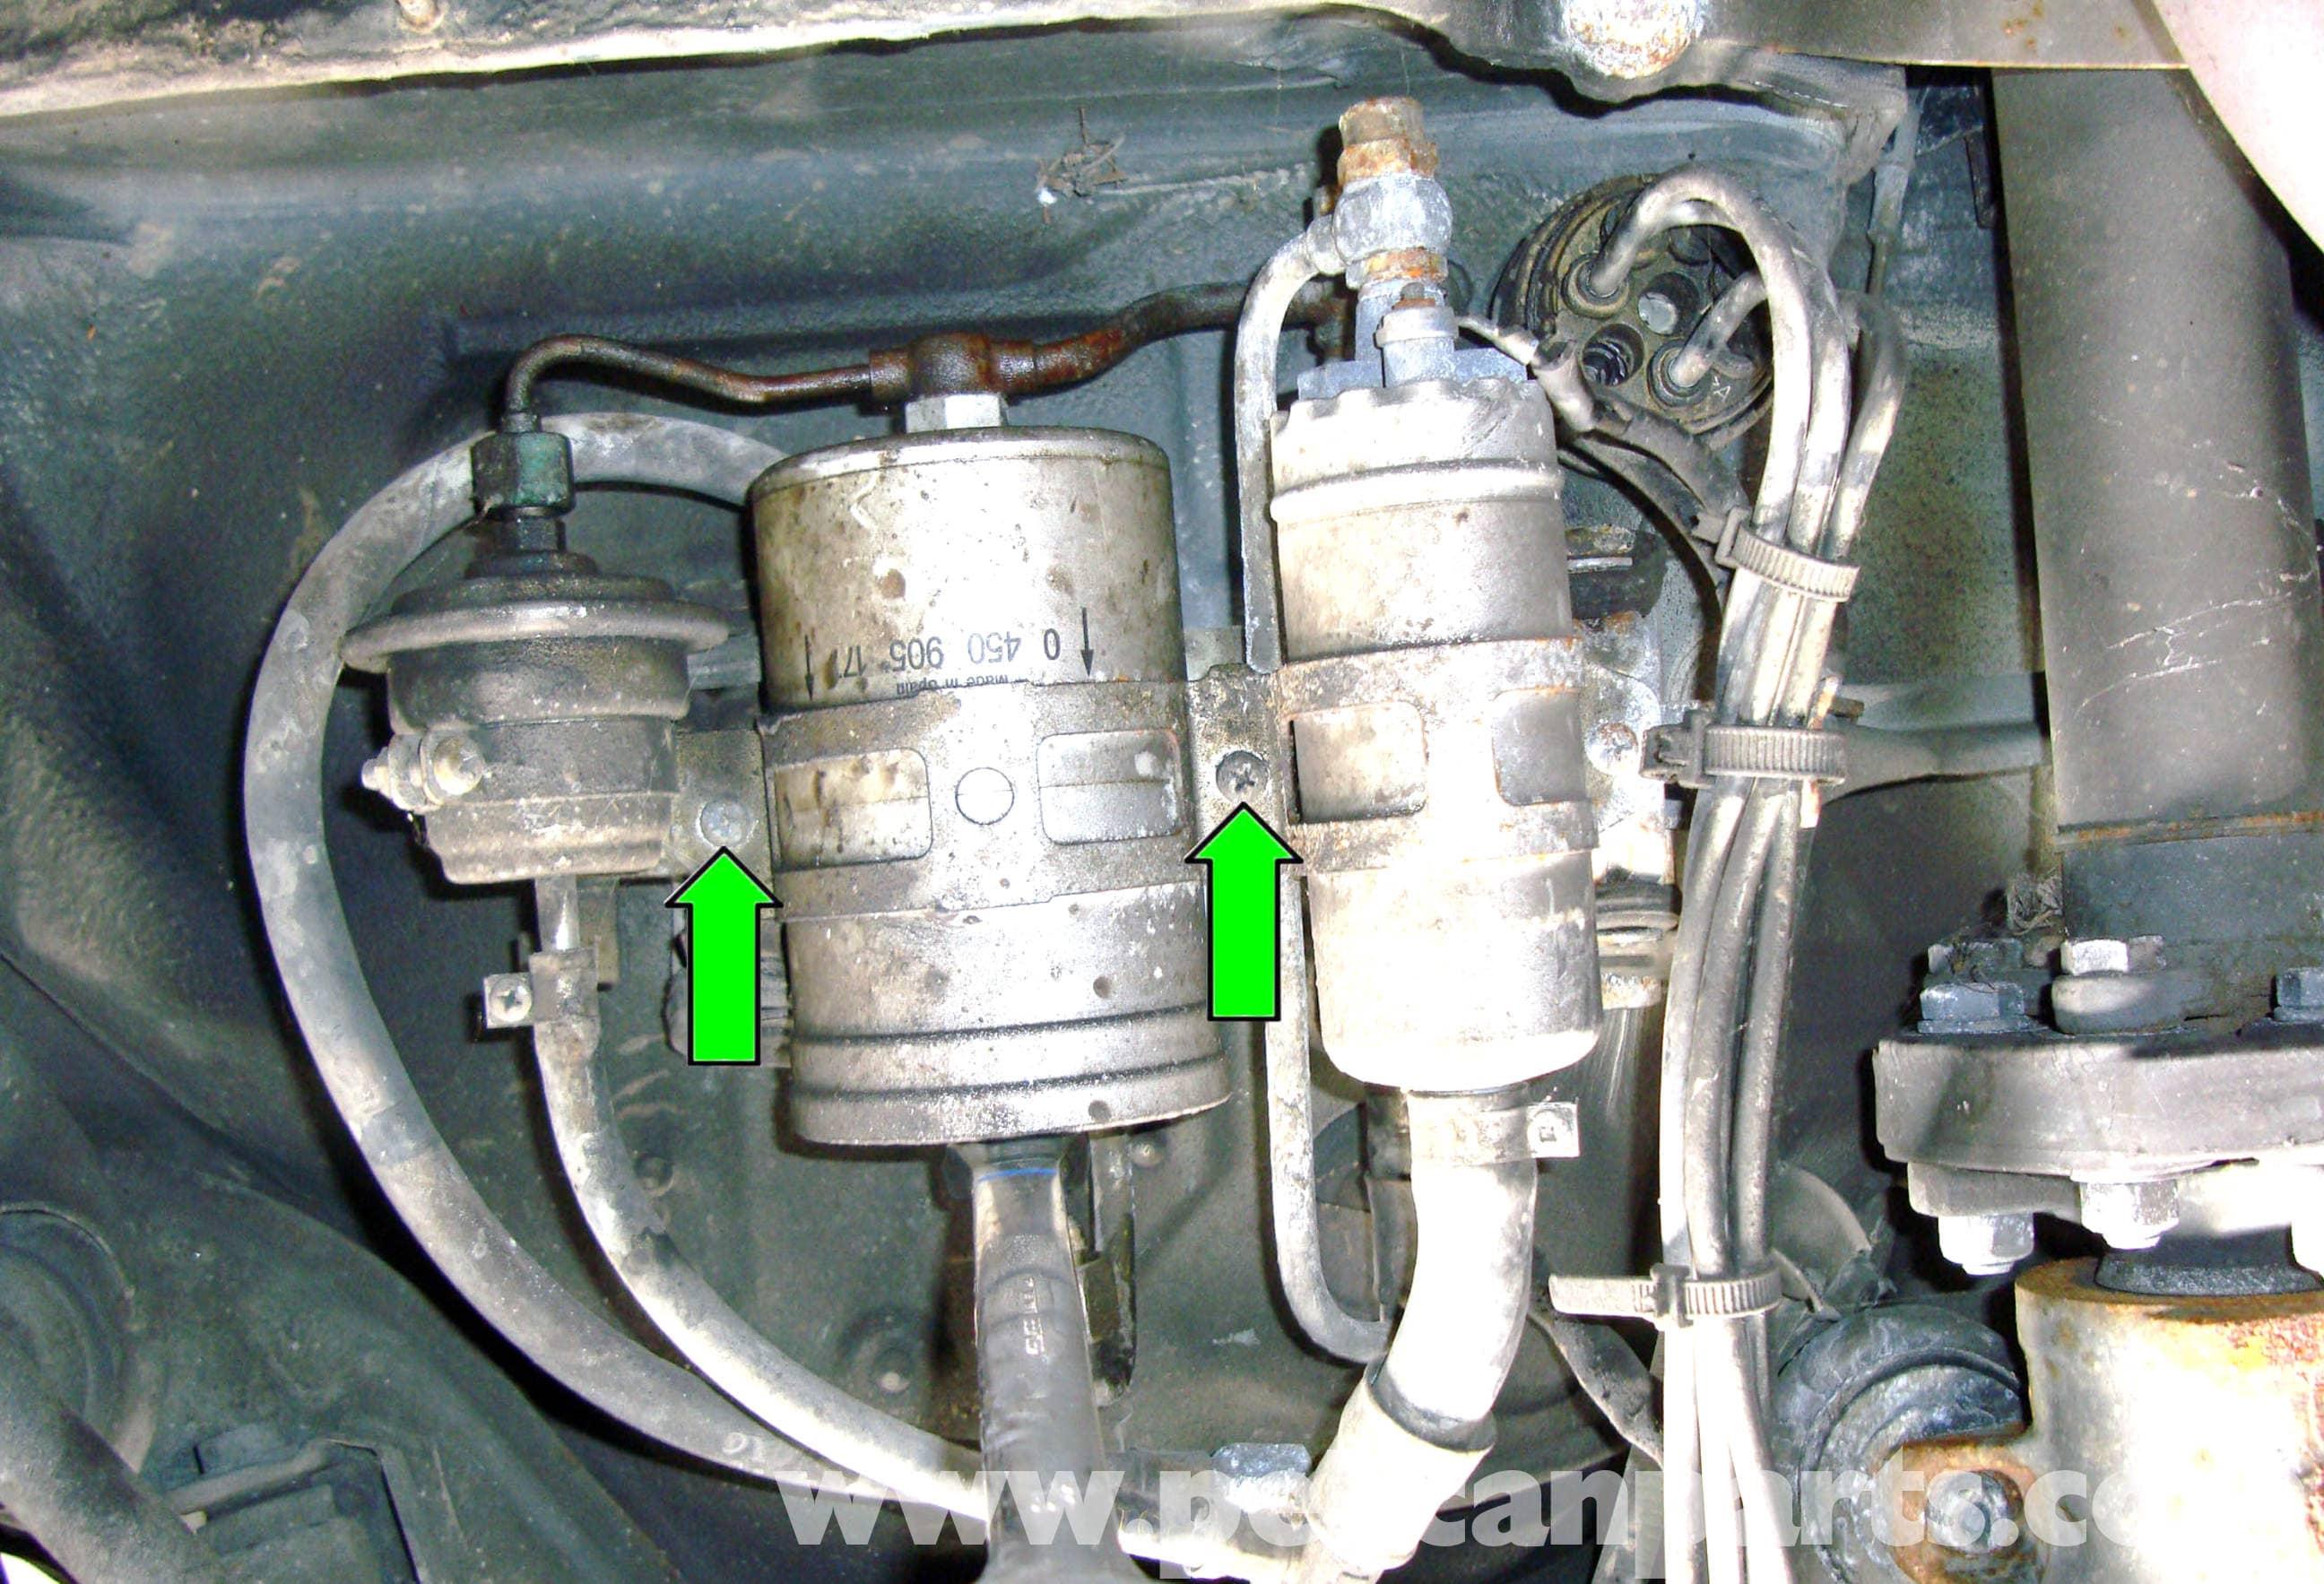 Mercedes benz r129 fuel filter removal sl500, 500sl, 300sl on mercedes r129 wiring diagram 2008 Mercedes C300 Light Wiring Diagrams mercedes r129 alarm wiring diagram